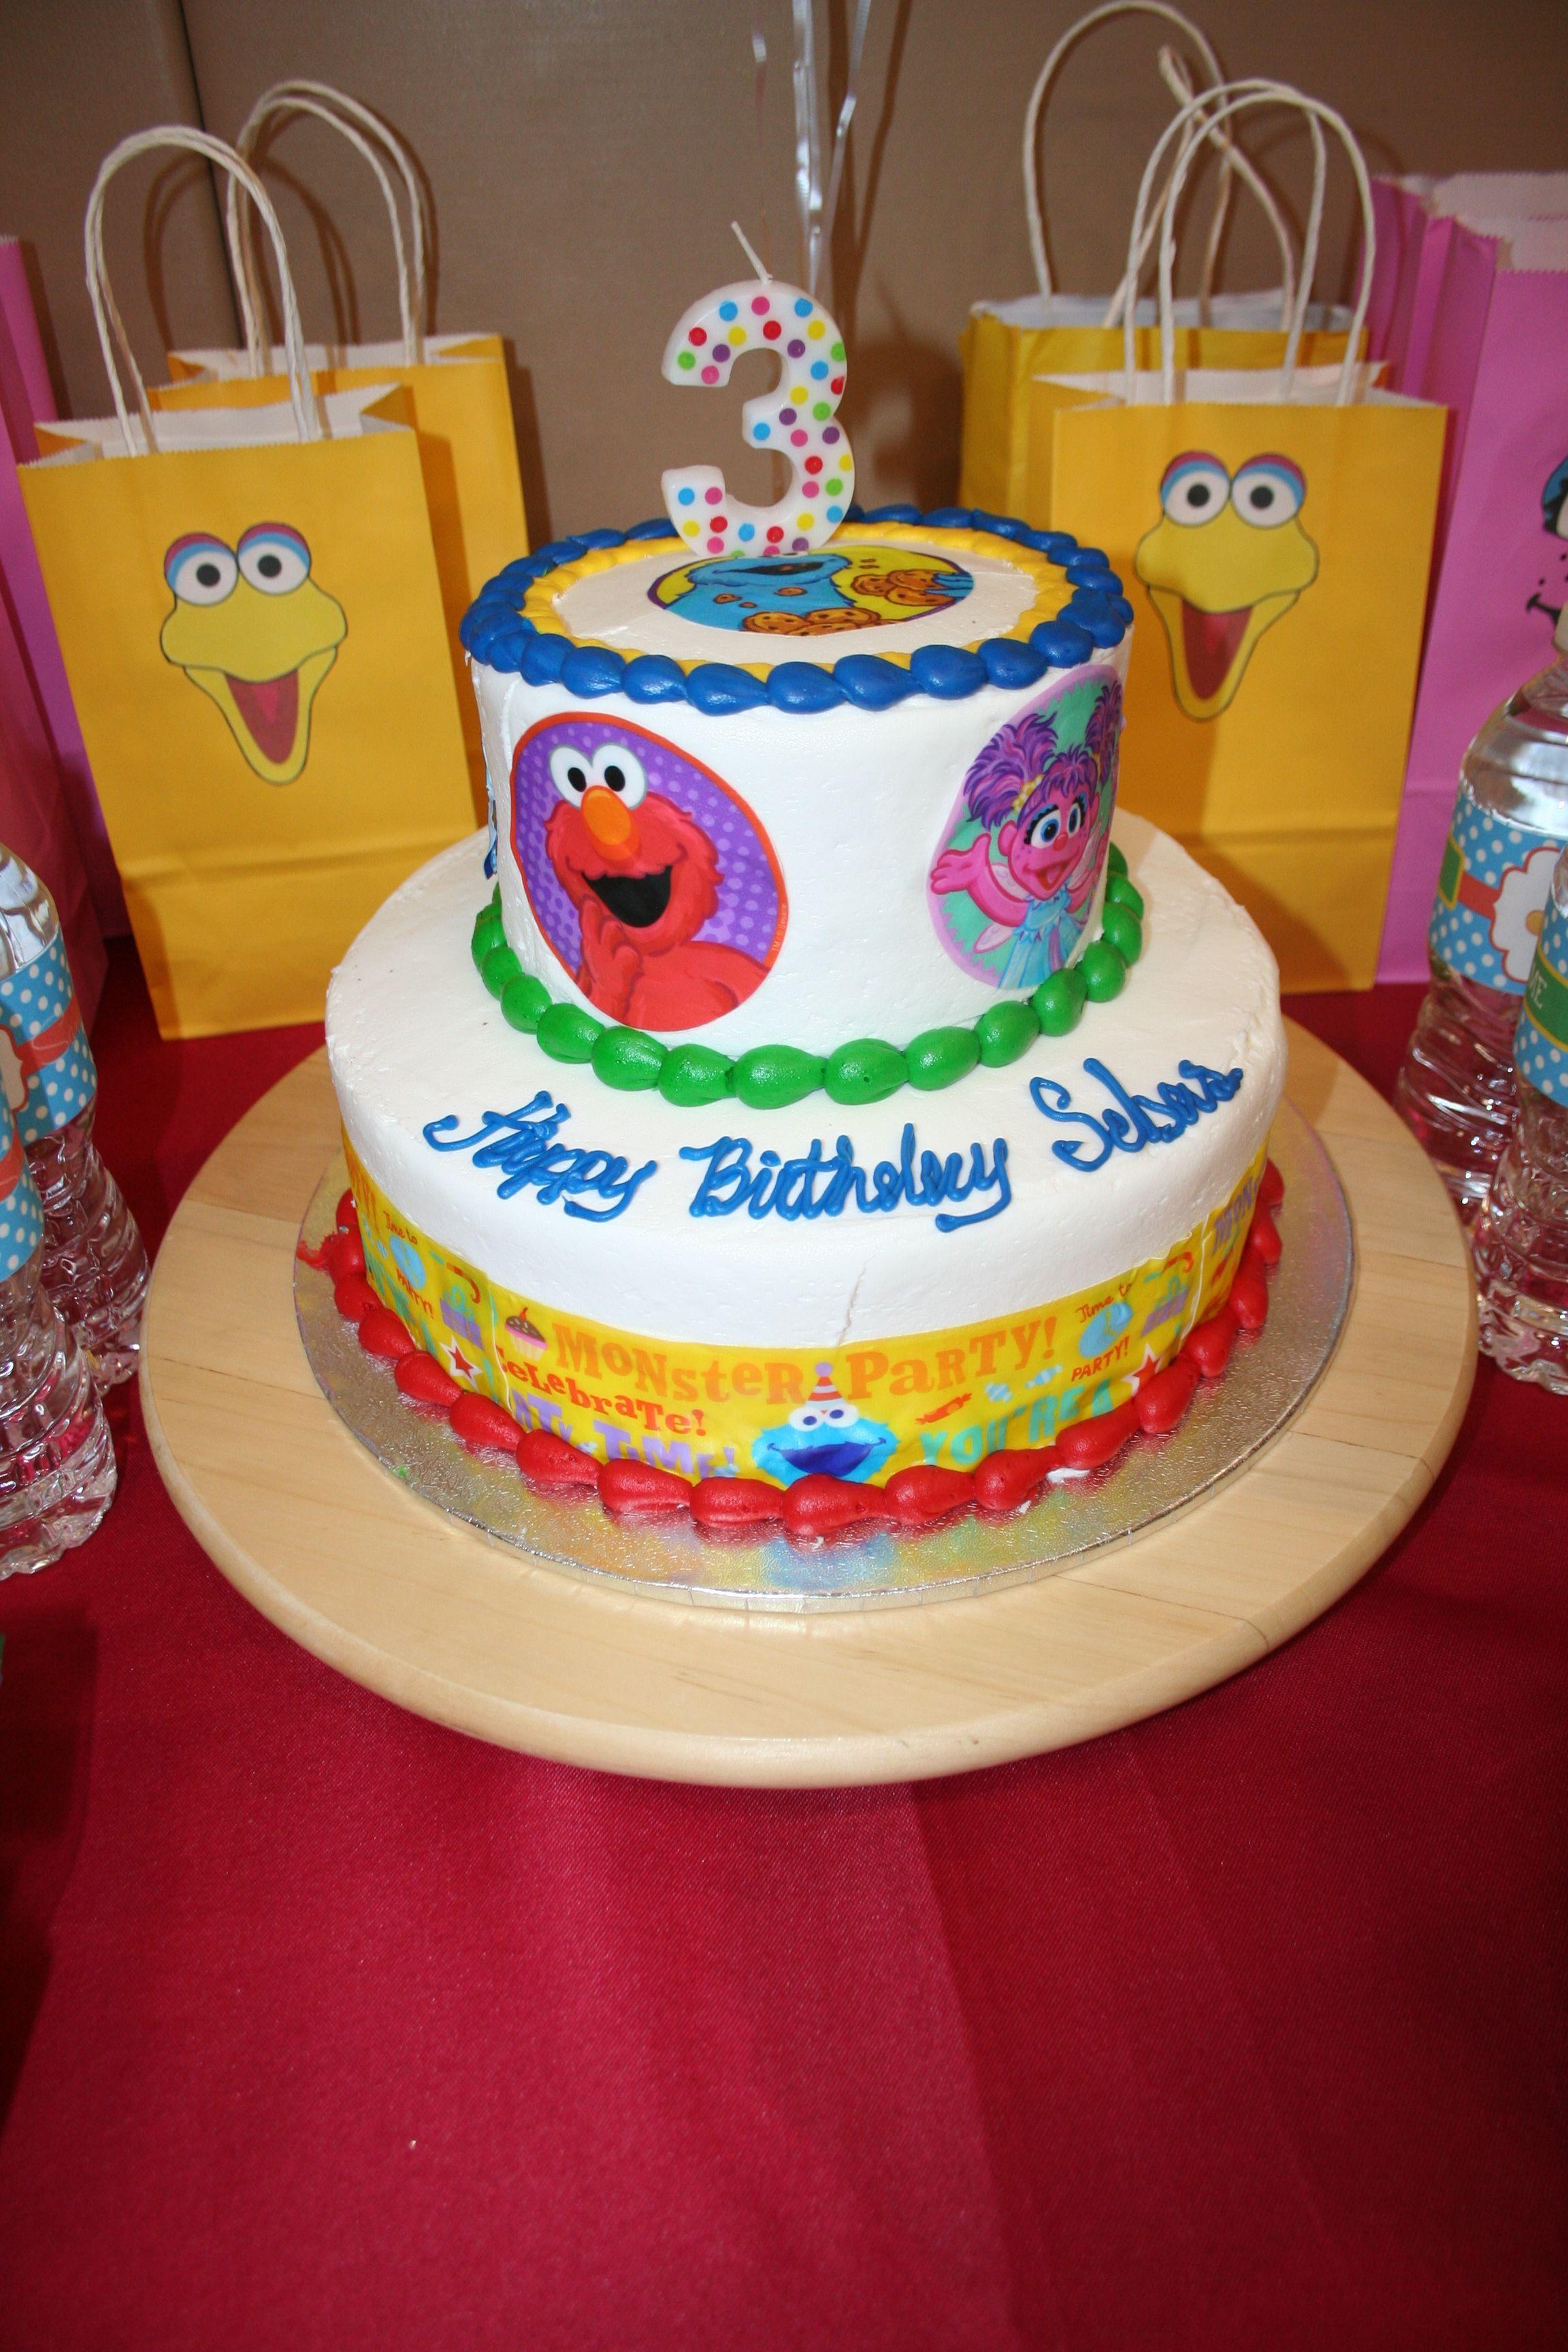 Enjoyable Sesame Street Cake It Was From Walmart Sesame Street Cake Personalised Birthday Cards Veneteletsinfo